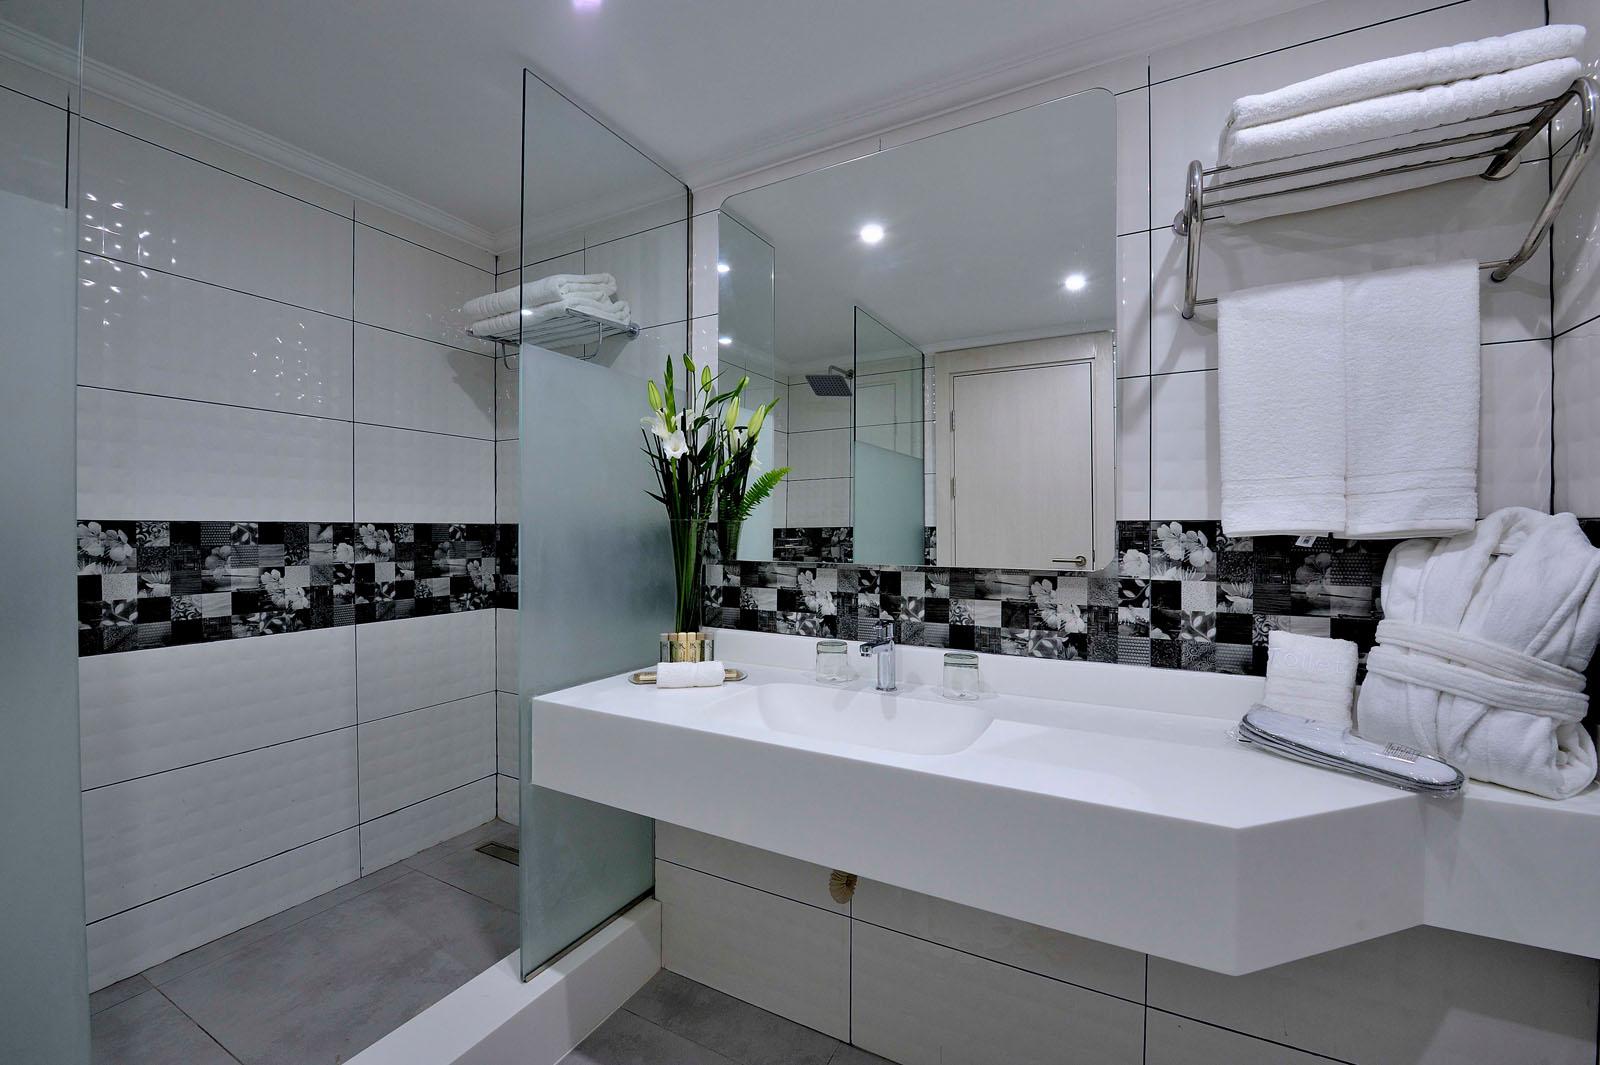 Bathroom at Kenzi Basma Hotel in Casablanca, Morocco